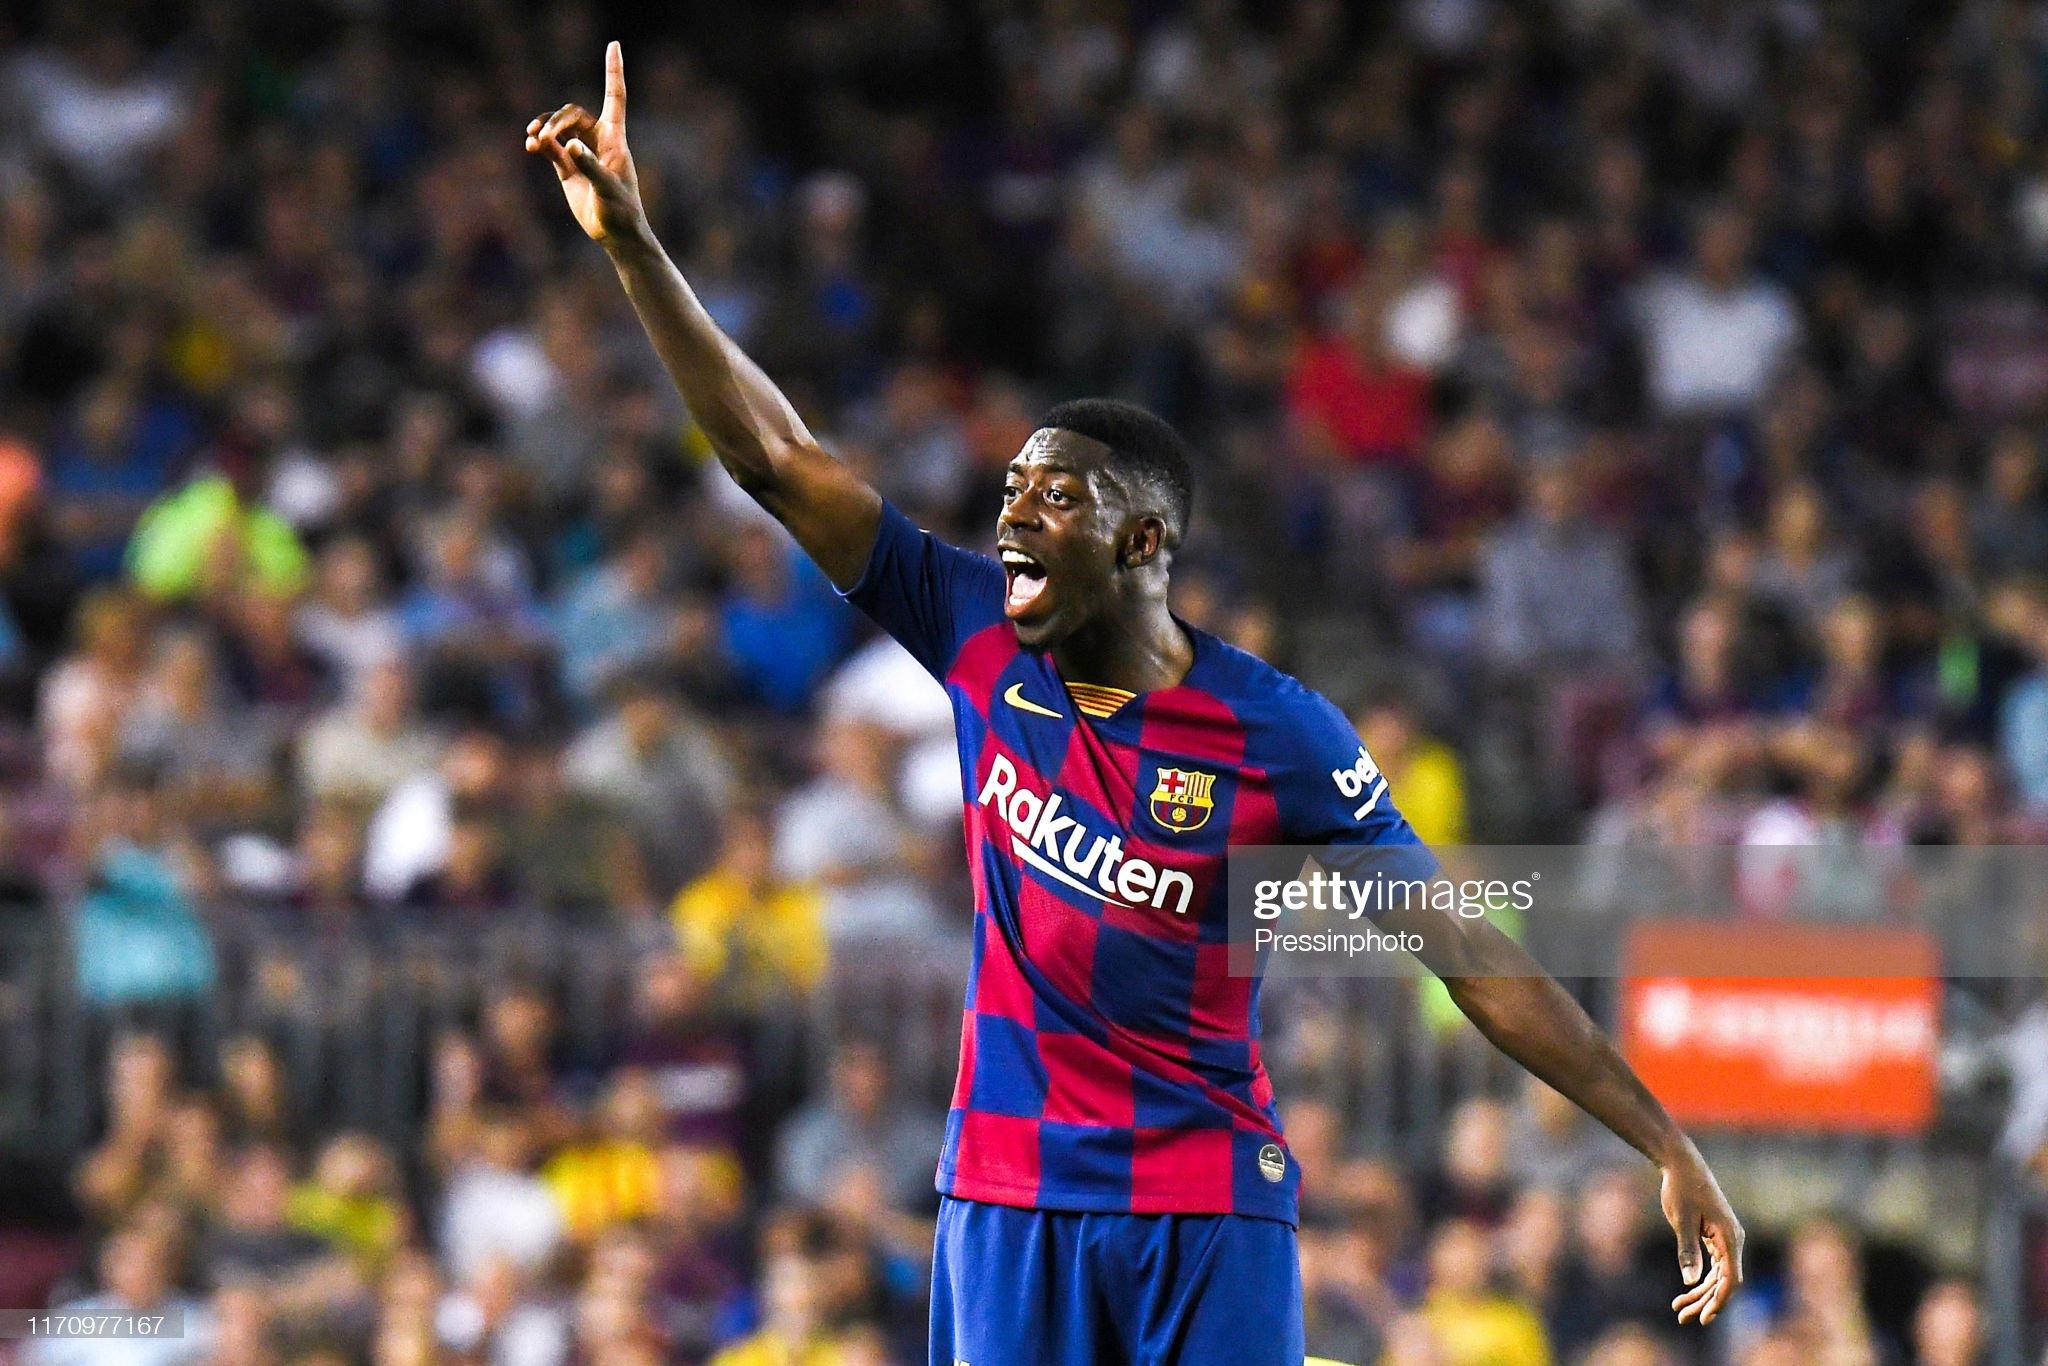 صور مباراة : برشلونة - فياريال 2-1 ( 24-09-2019 )  Ousmane-dembele-of-fc-barcelona-during-the-liga-match-between-and-picture-id1170977167?s=2048x2048